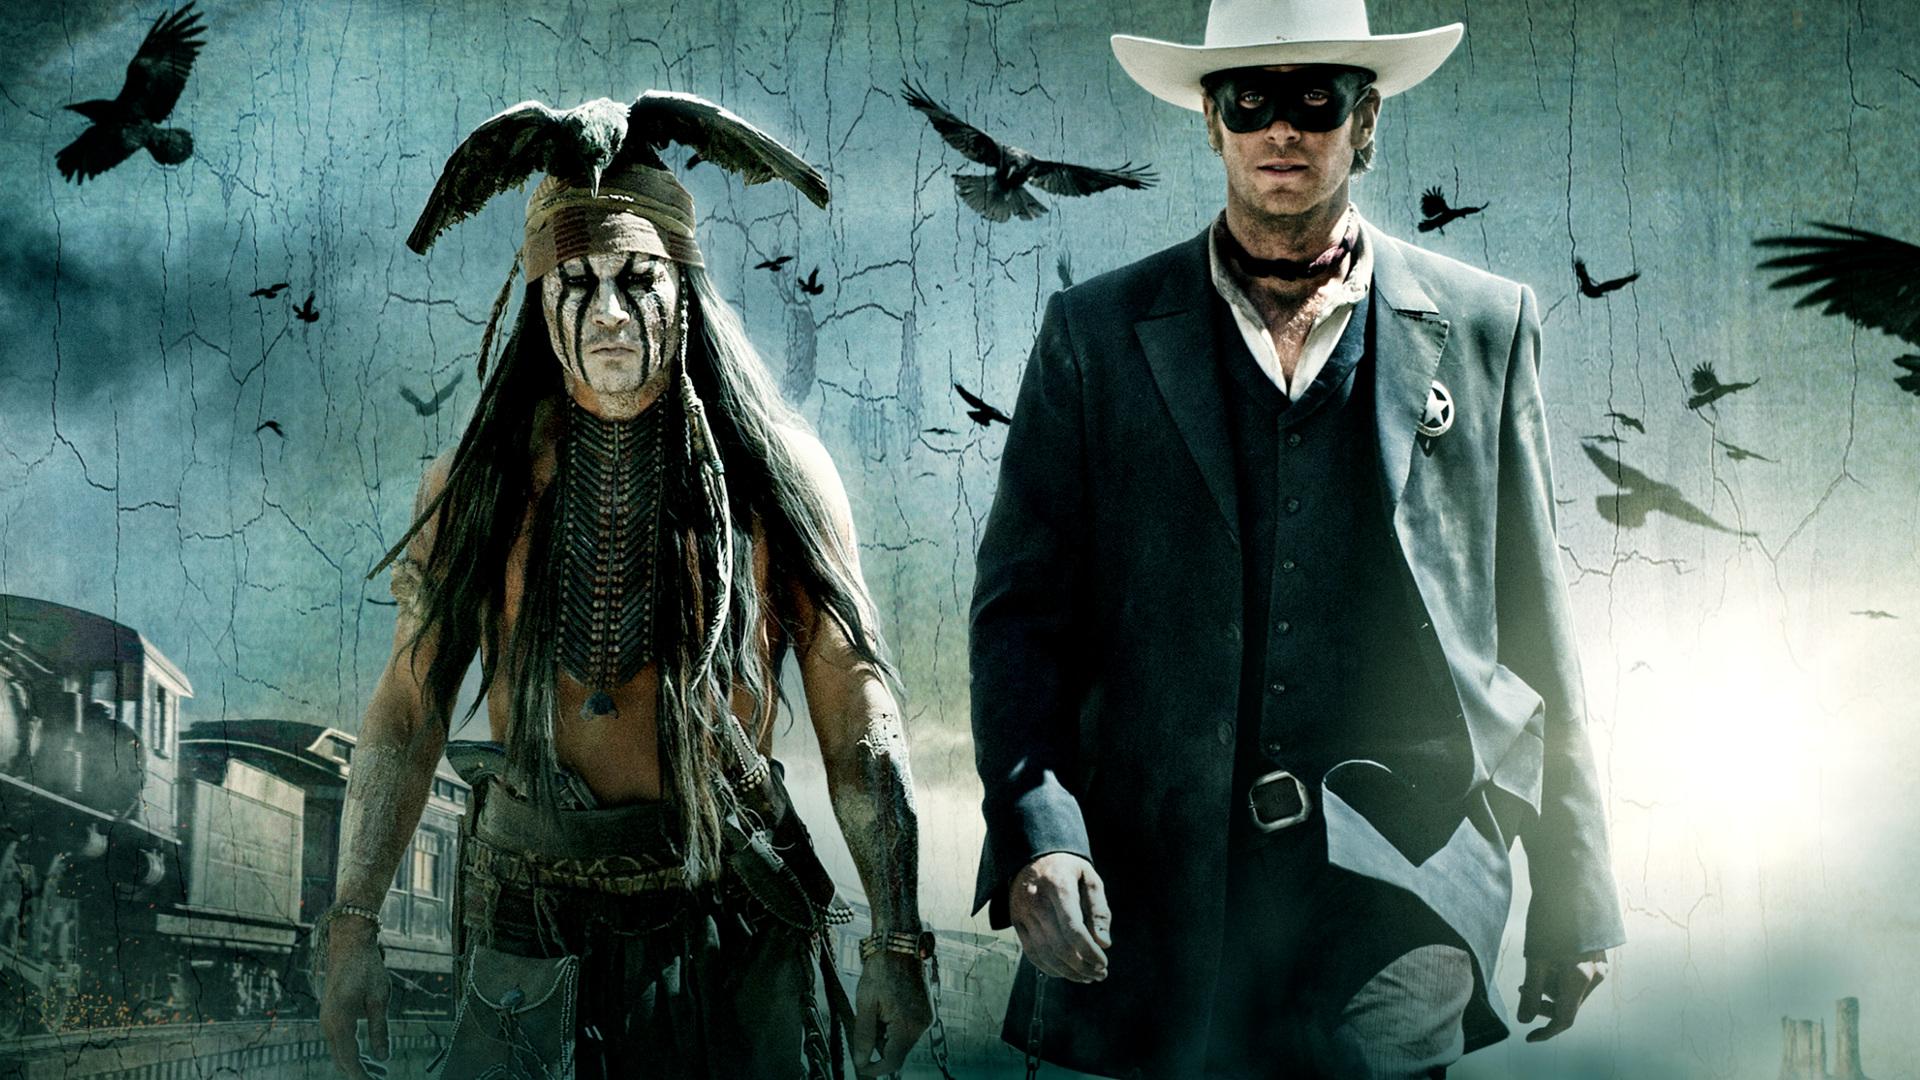 Watch The Lone Ranger (2013) Full Online - M4Ufree